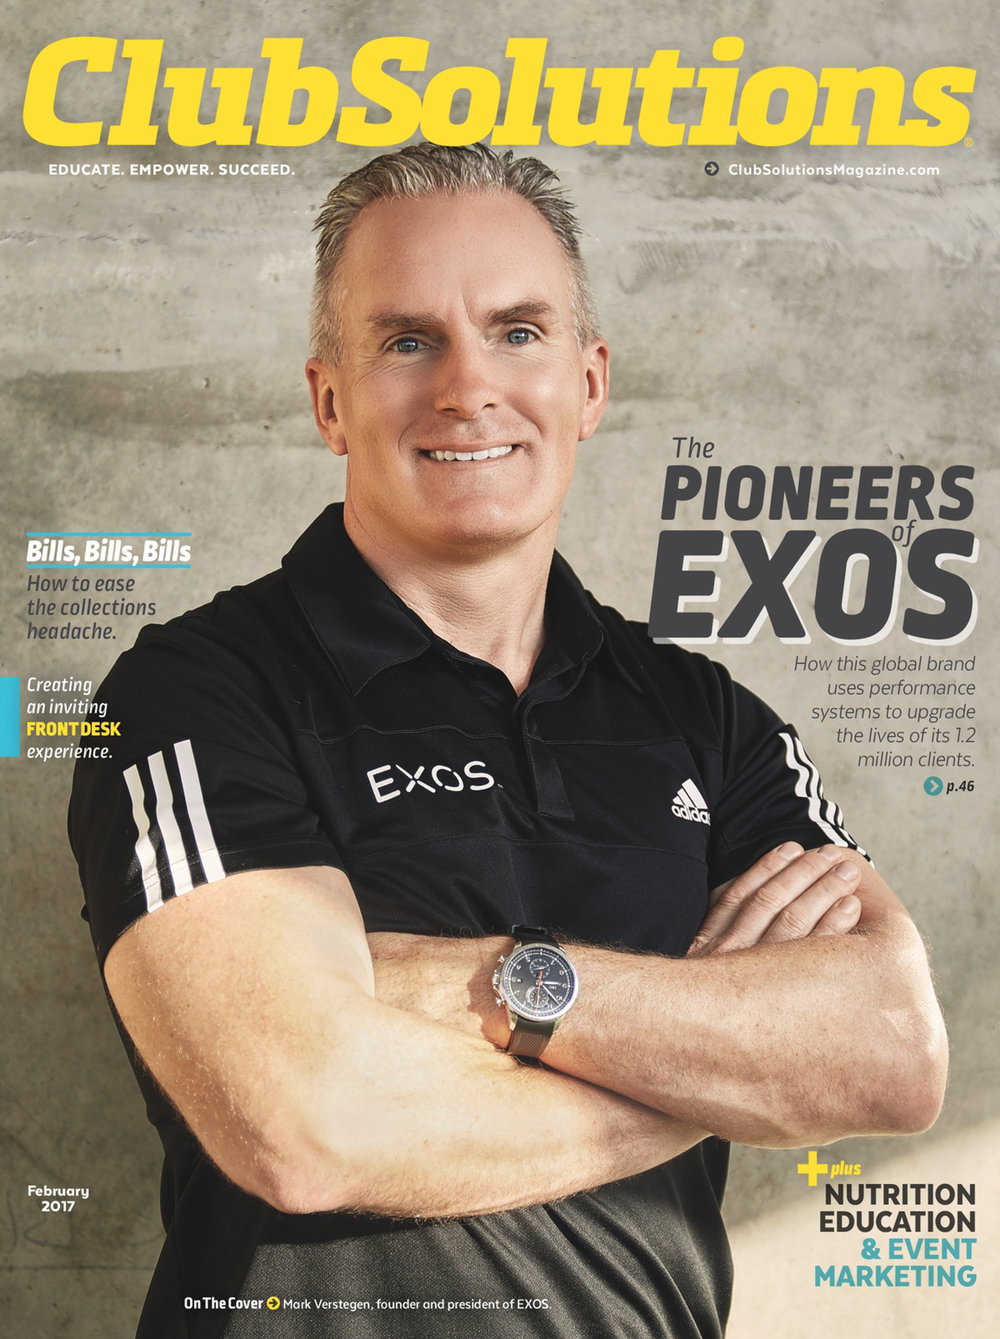 Club Solutions Magazine Cover Photo - EXOS Mark Verstegen